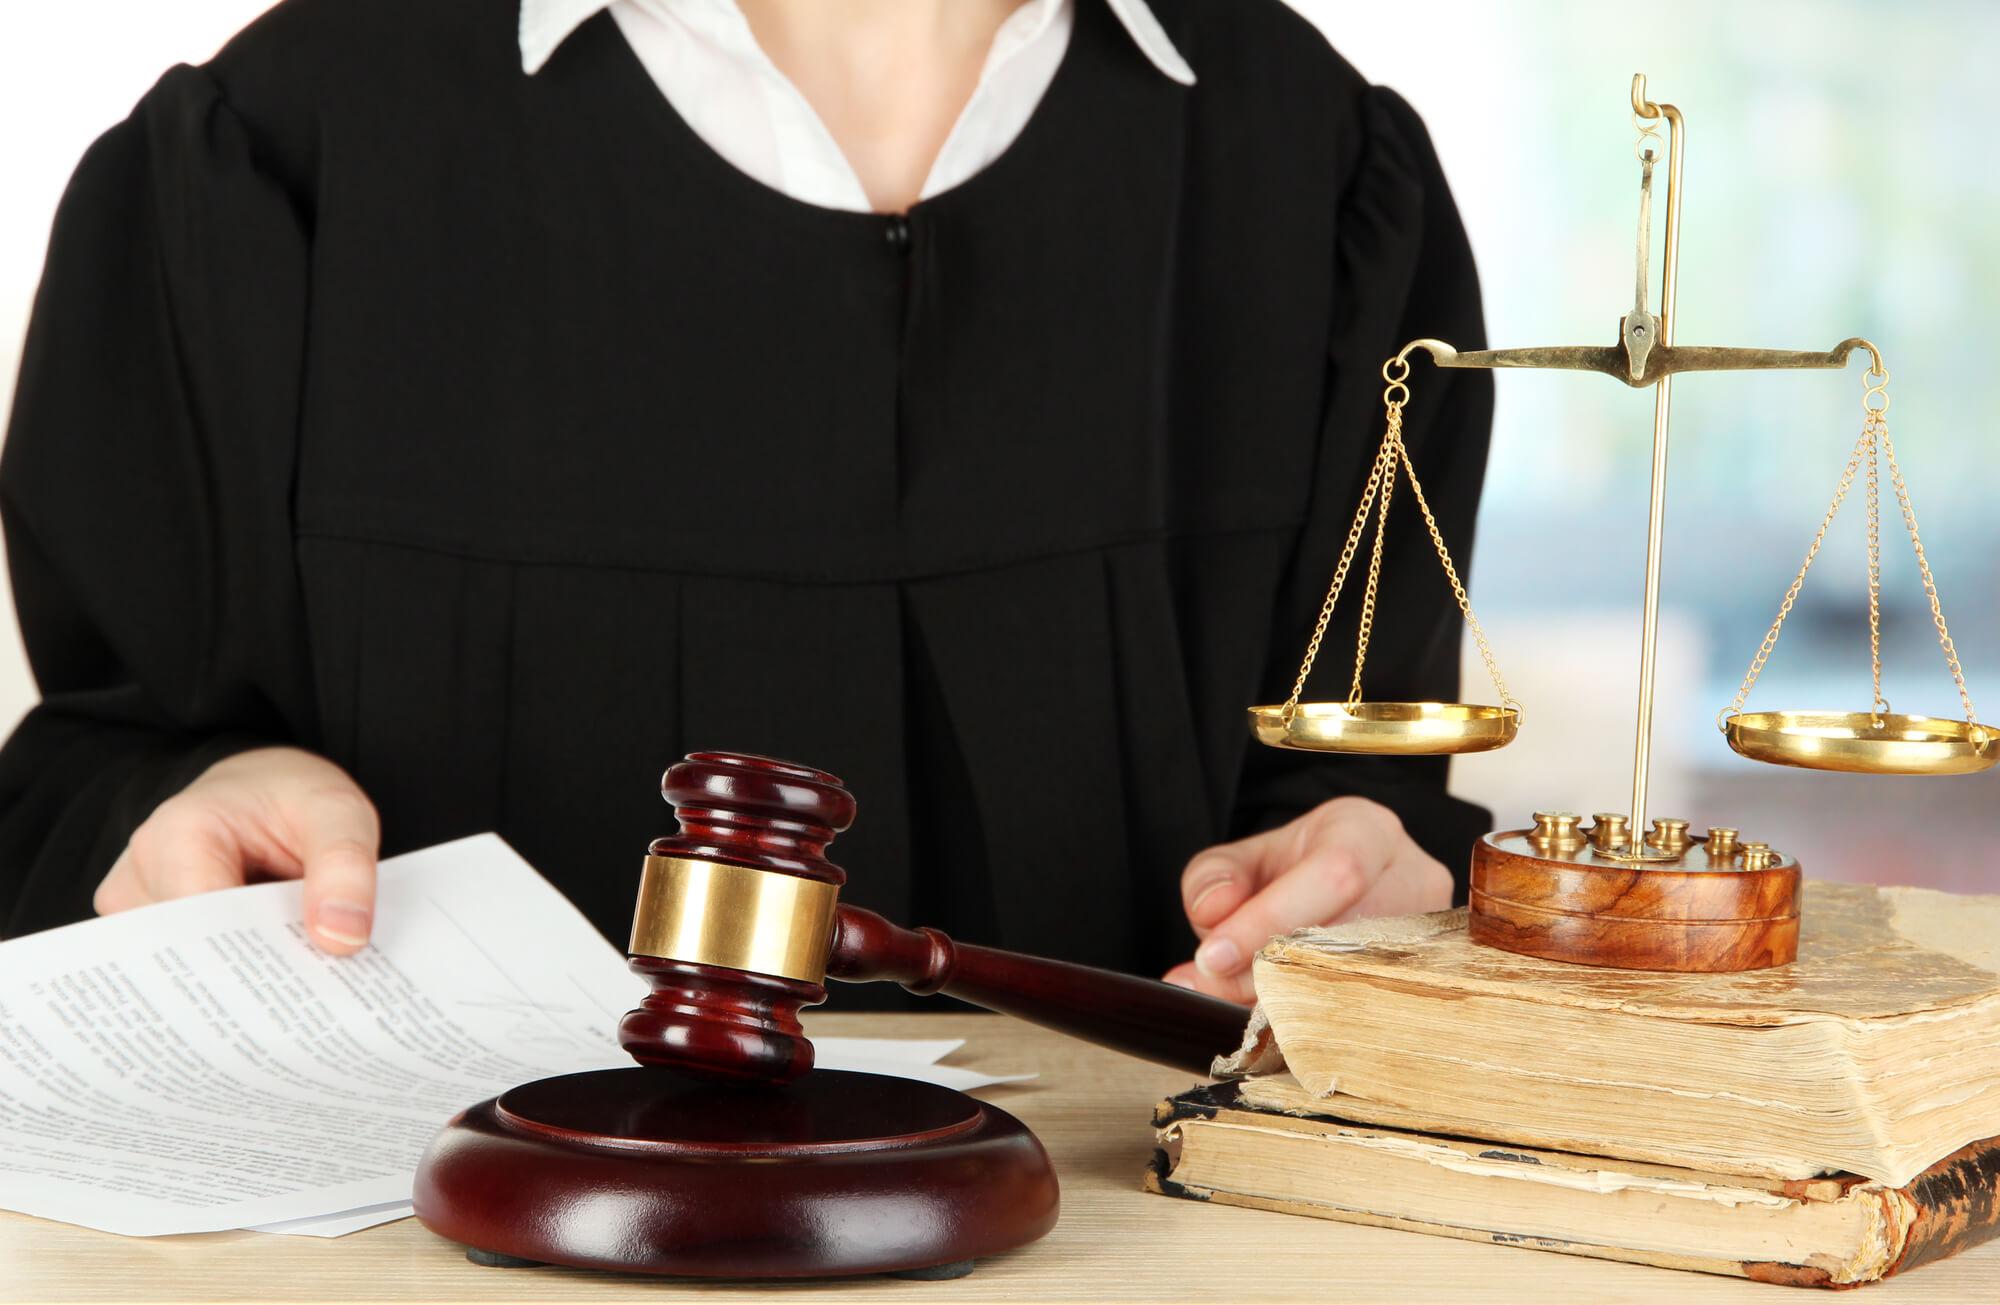 юрист в арбитражный суд